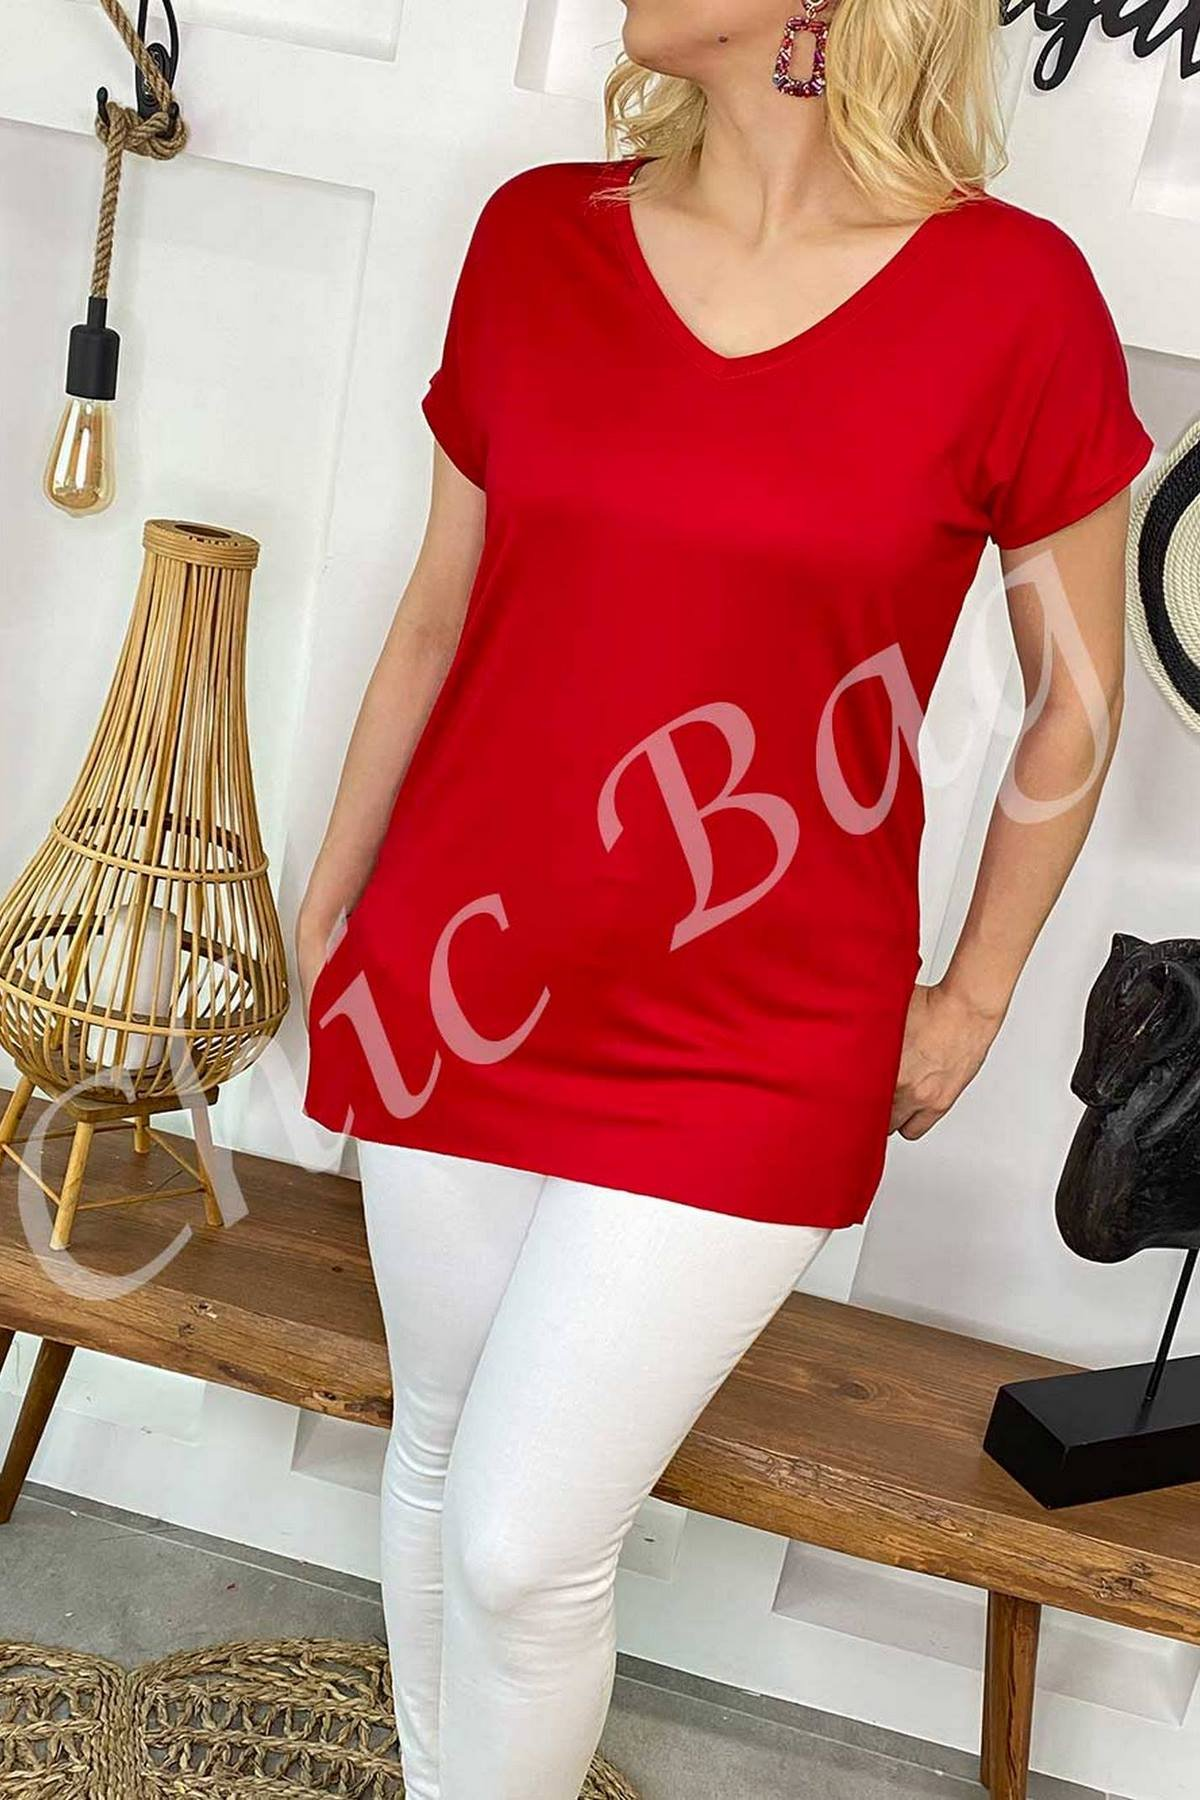 https://resim.chicbag.com.tr/p000879/krz/v-yaka-etegi-kesik-ve-yirtmacli-t-shirt-thscrt-01e46e348f0b.